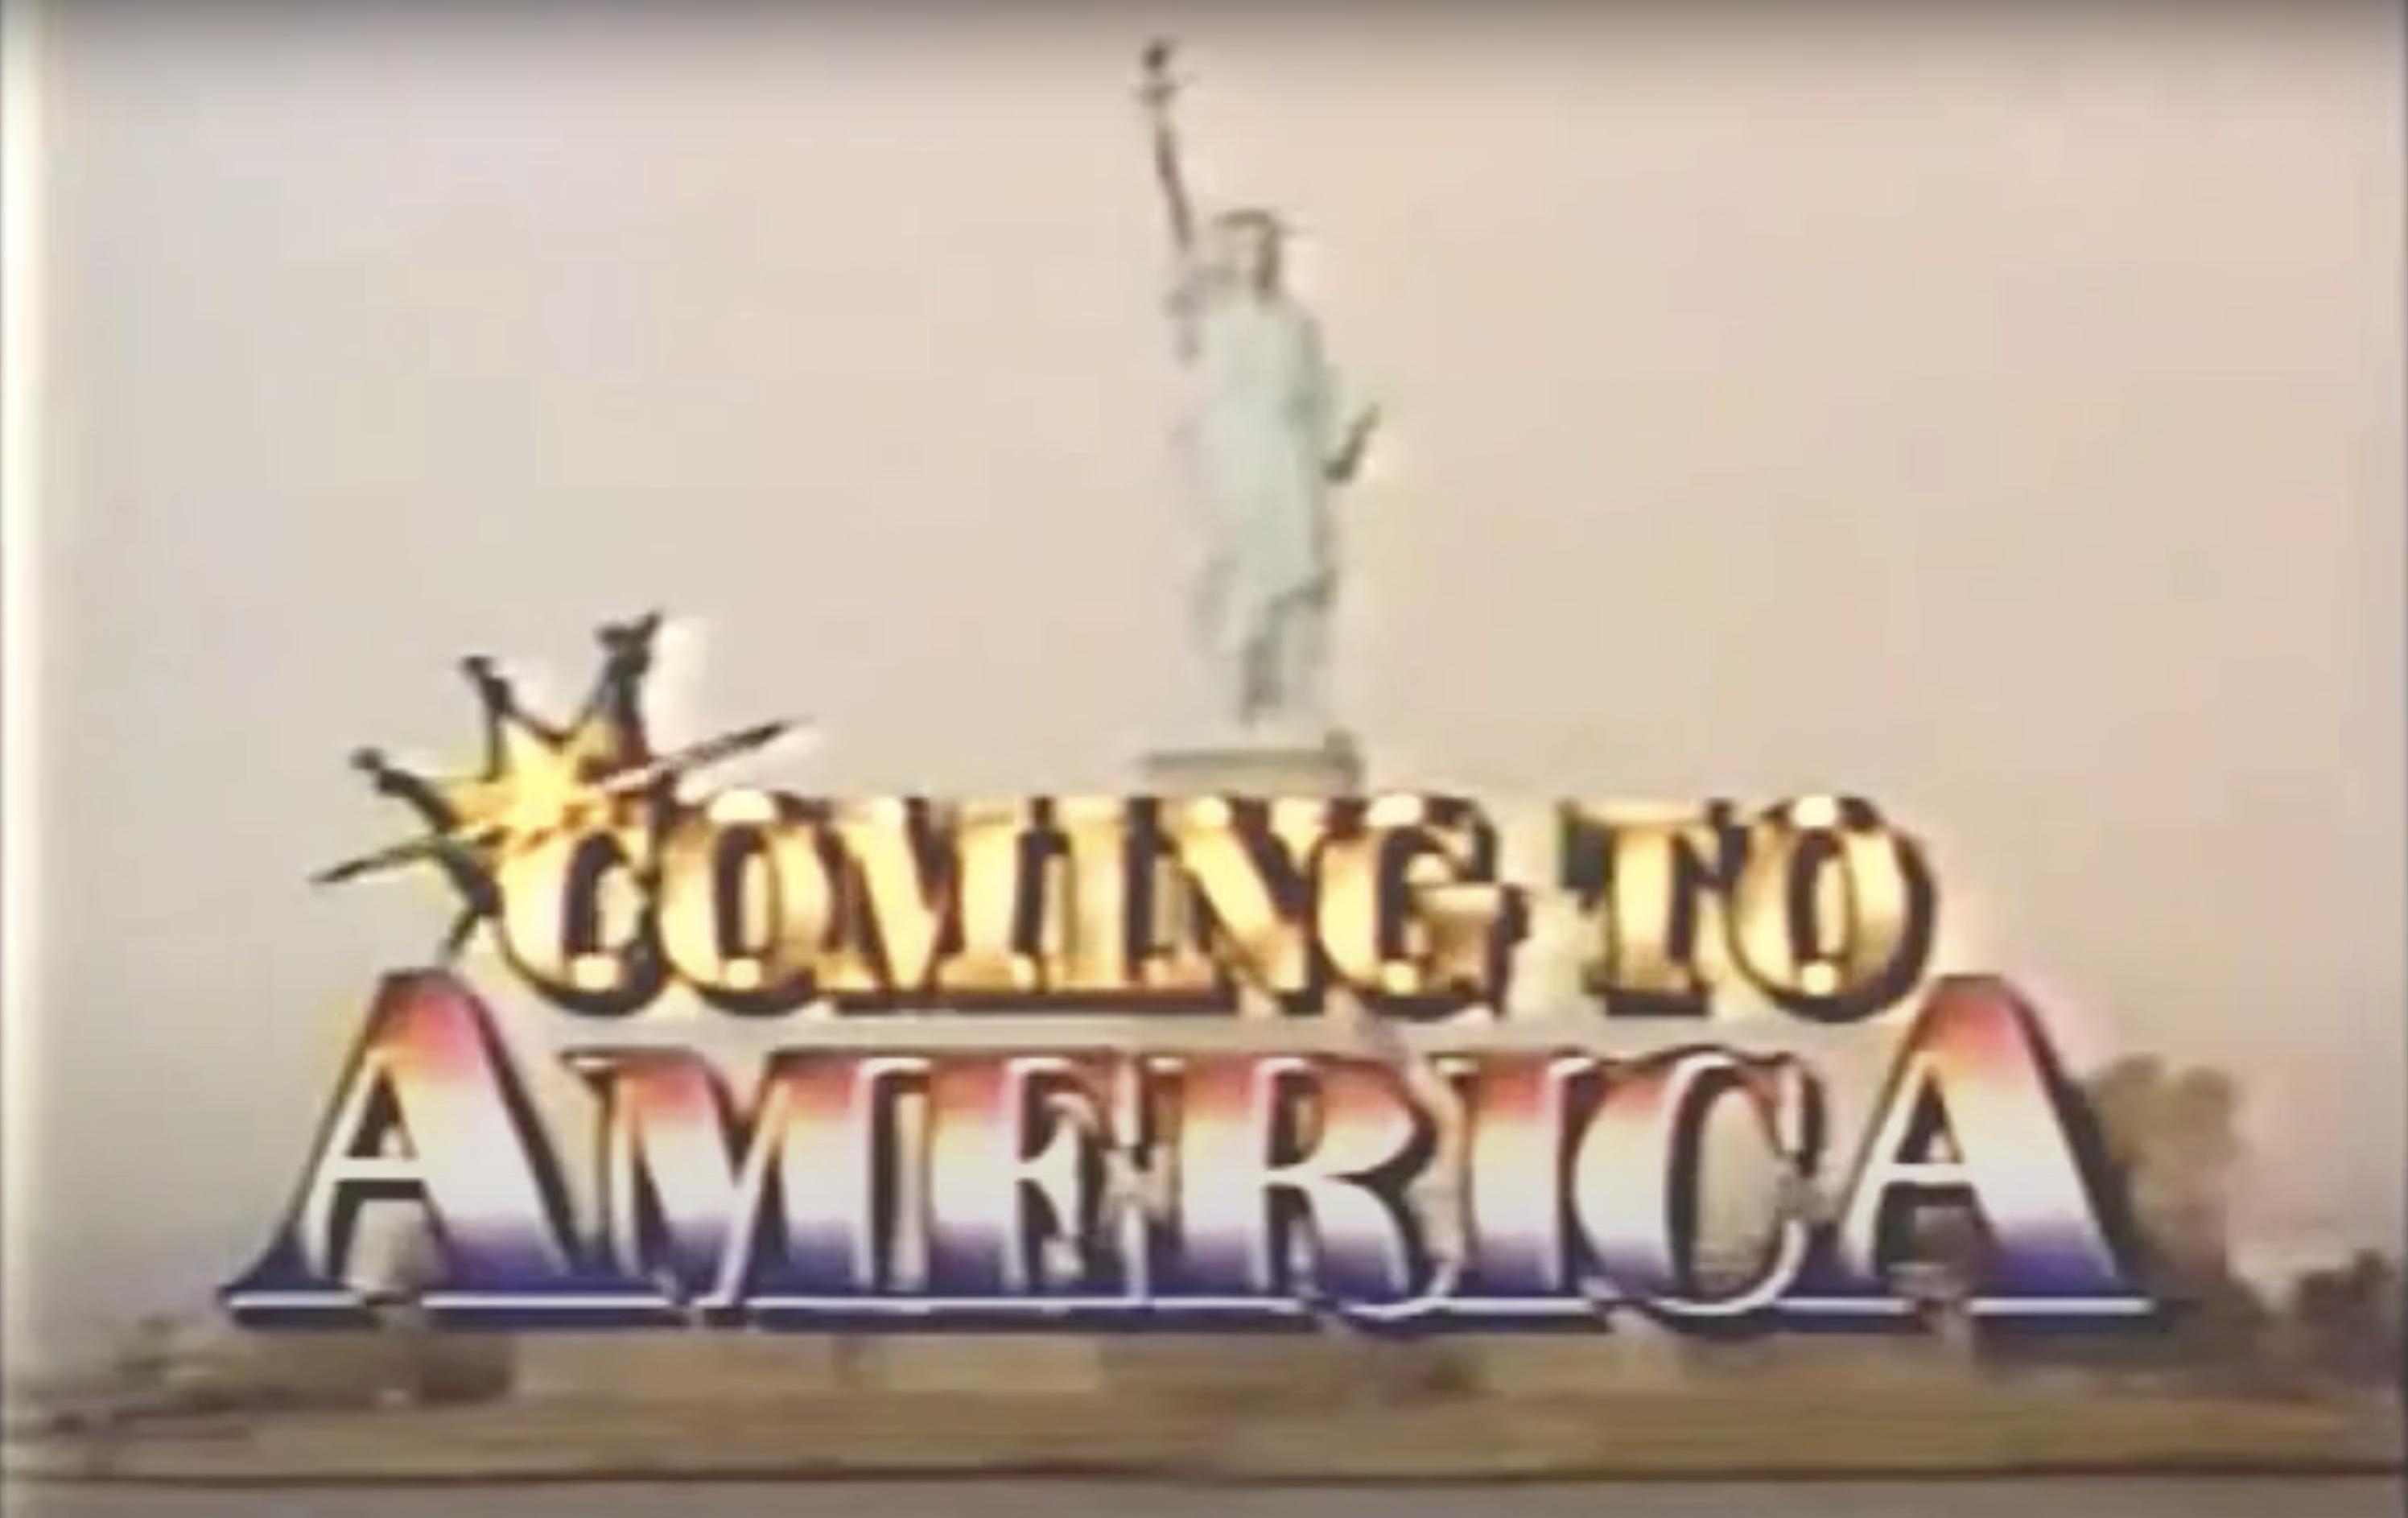 \u200bThe opening credits of the Coming to America sitcom pilot